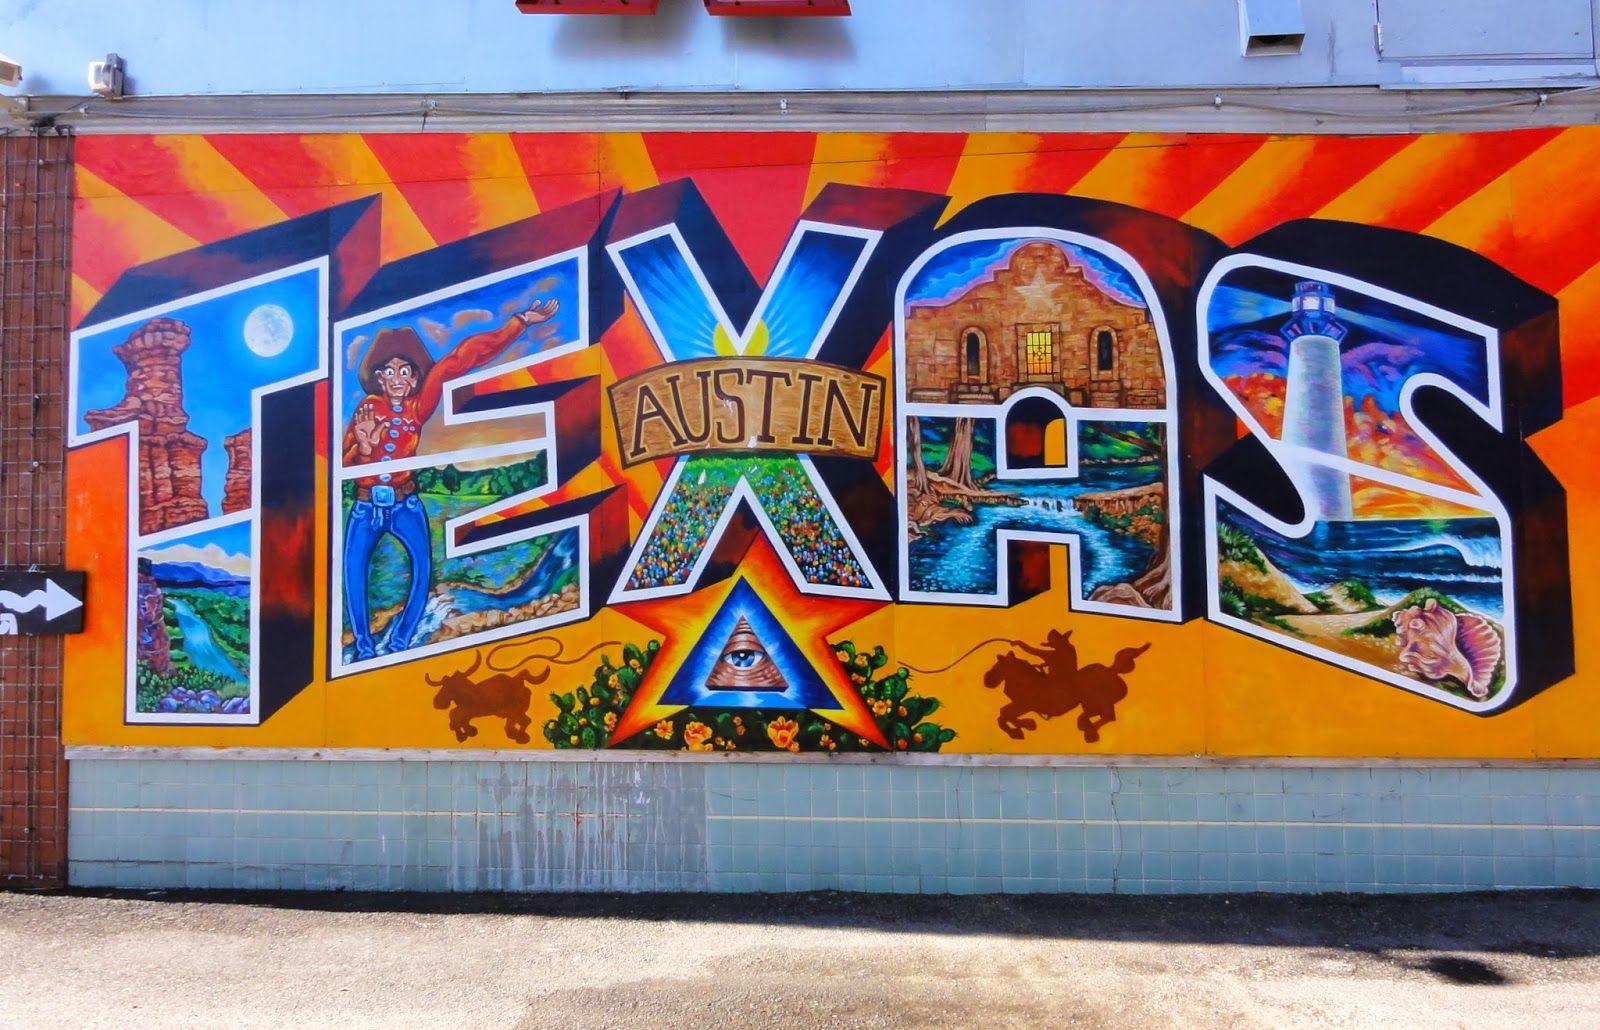 Free fun in austin exploring austins street art murals